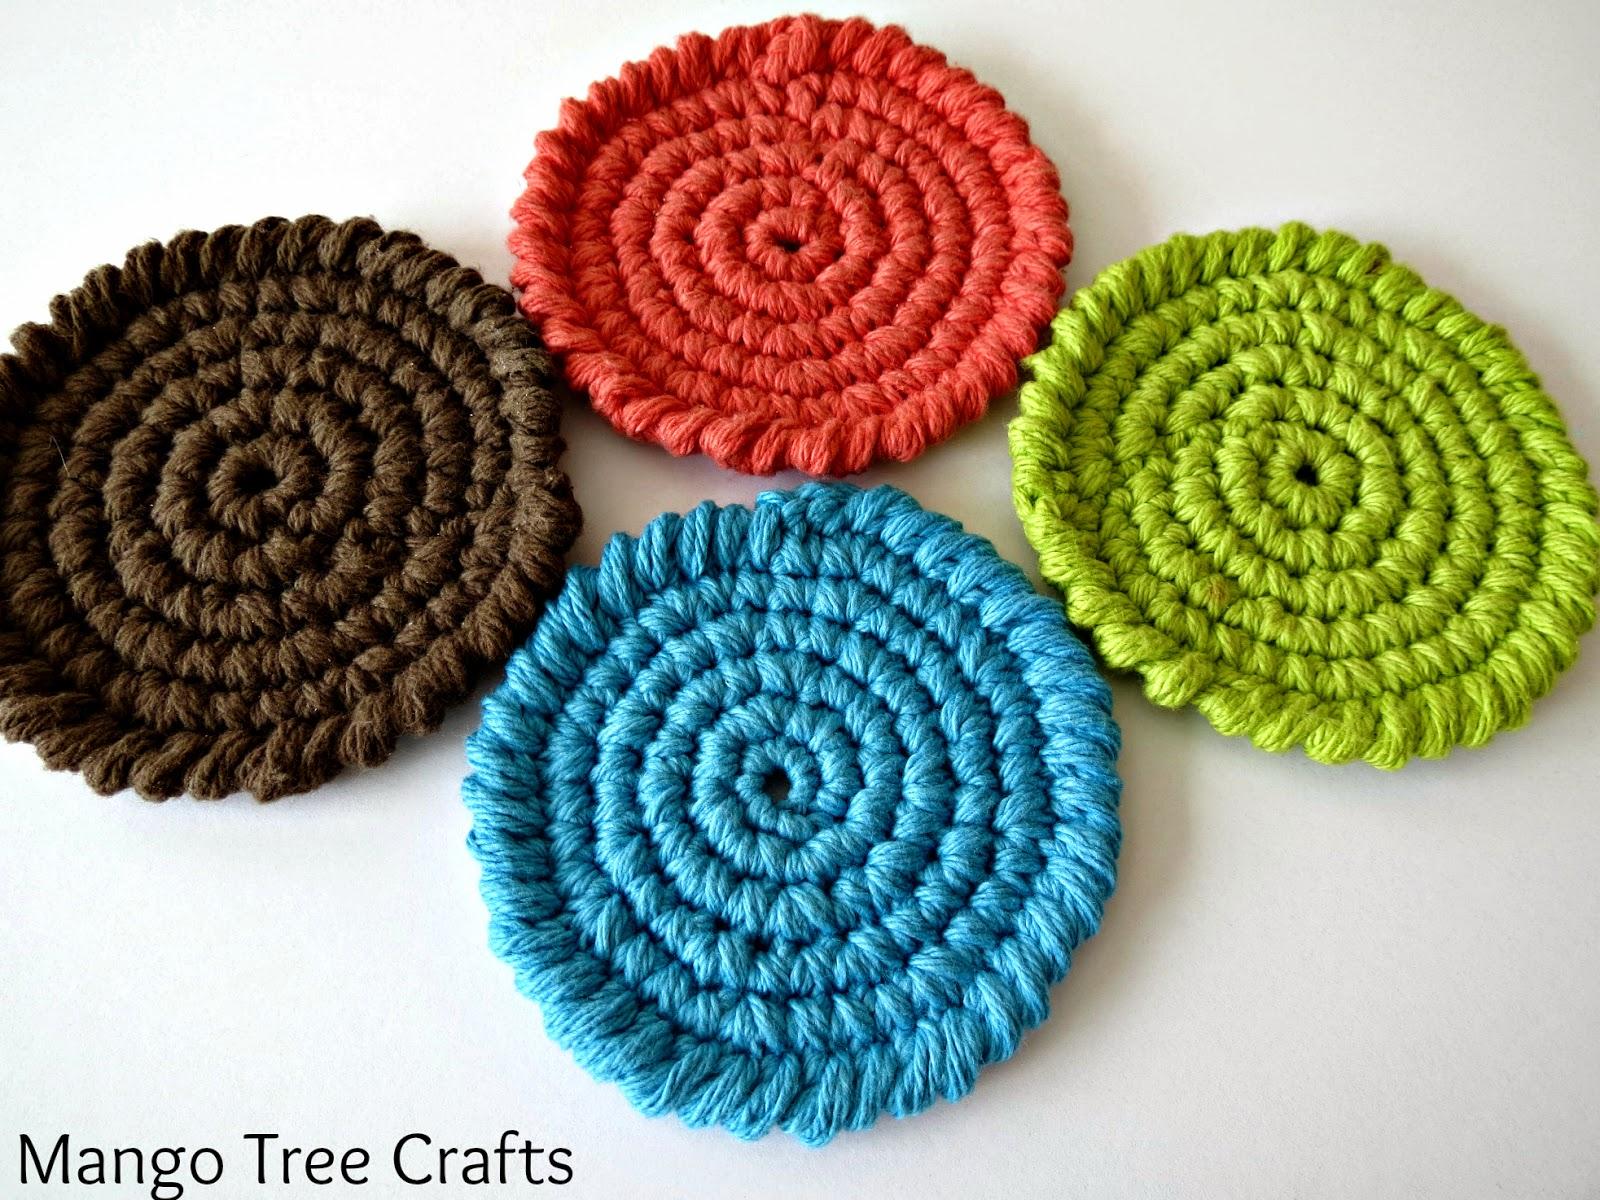 Free Crochet Patterns Club: Free Crochet Coasters Pattern